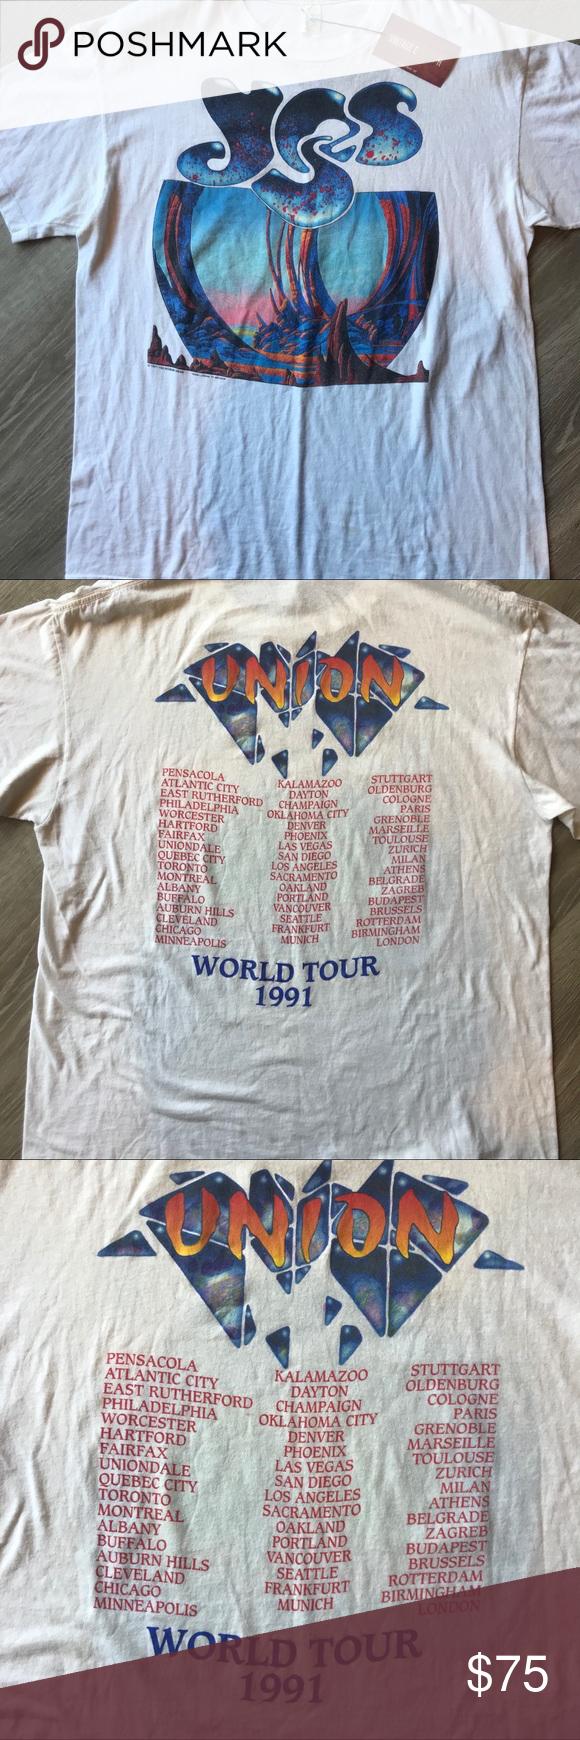 Vintage Yes T Shirt Vintage Tour T Shirts Vintage Shirts